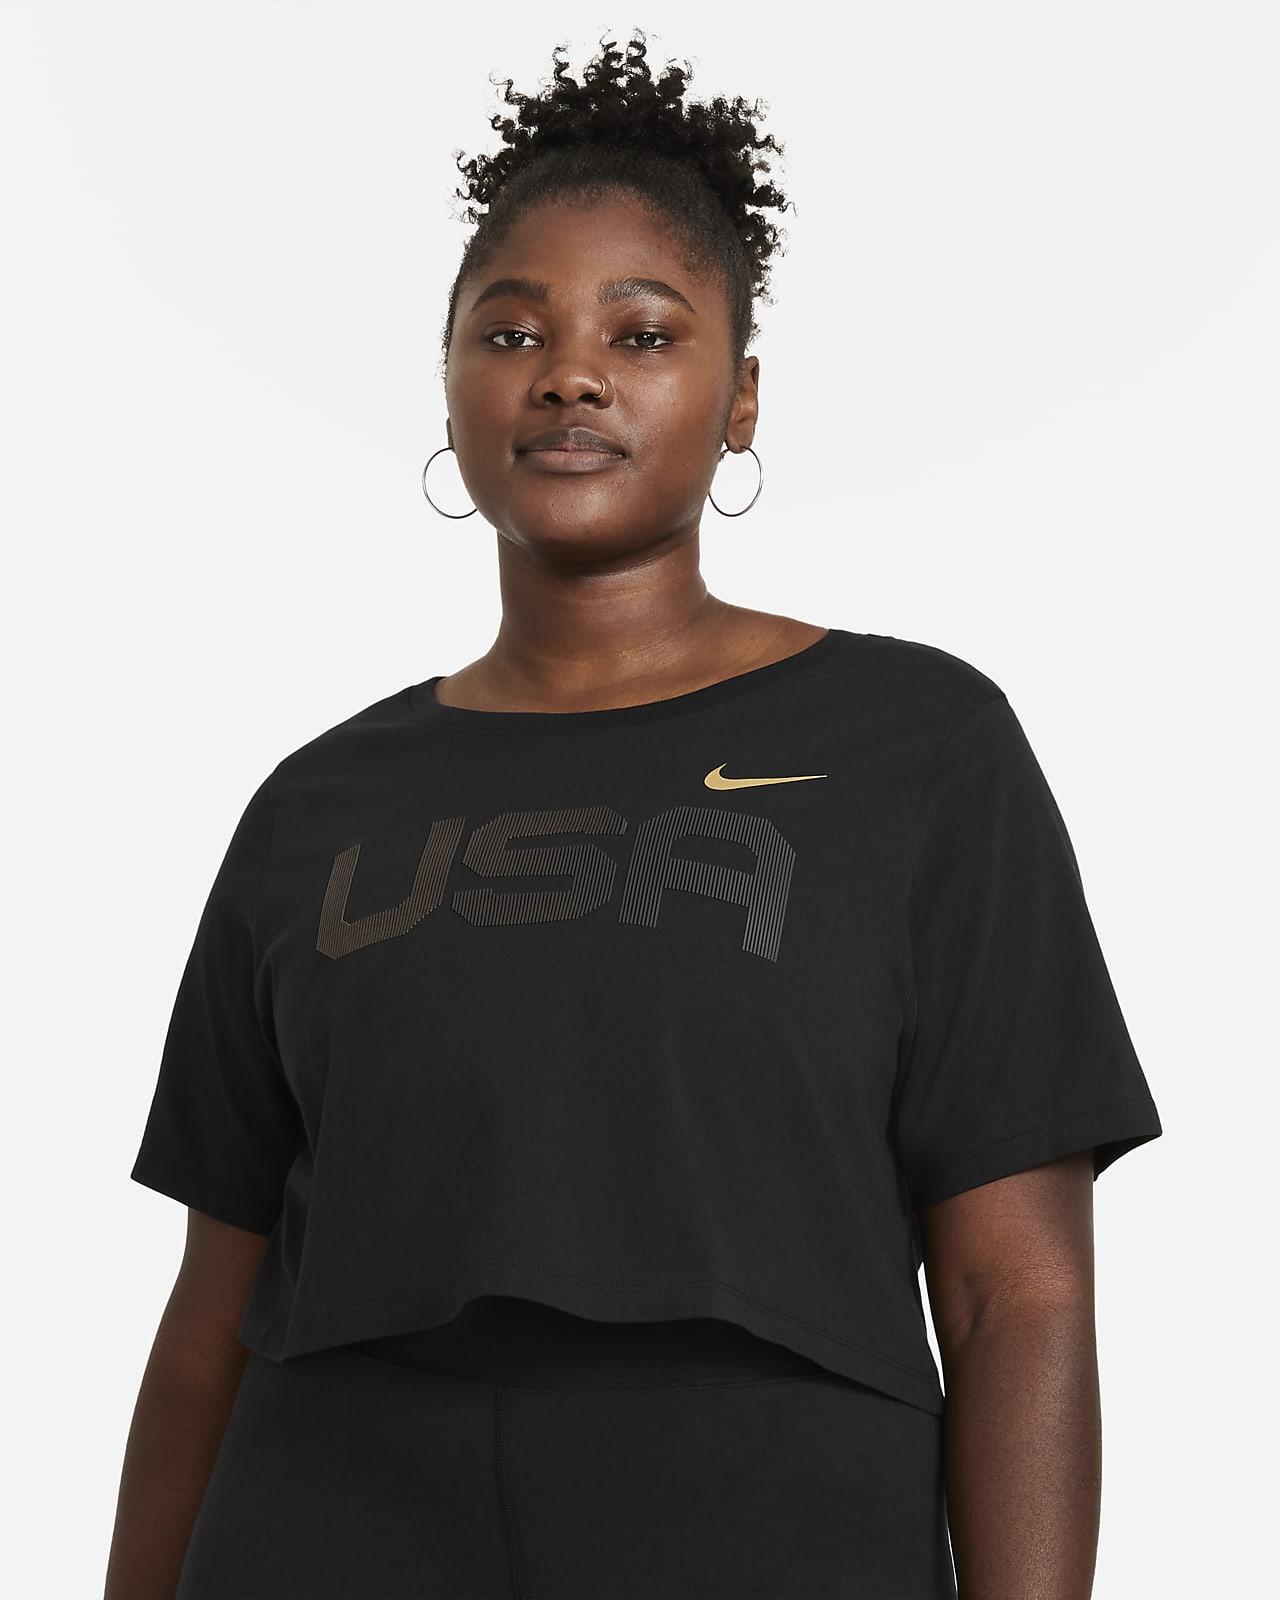 Nike Sportswear Women's USA Crop T-Shirt (Plus Size)